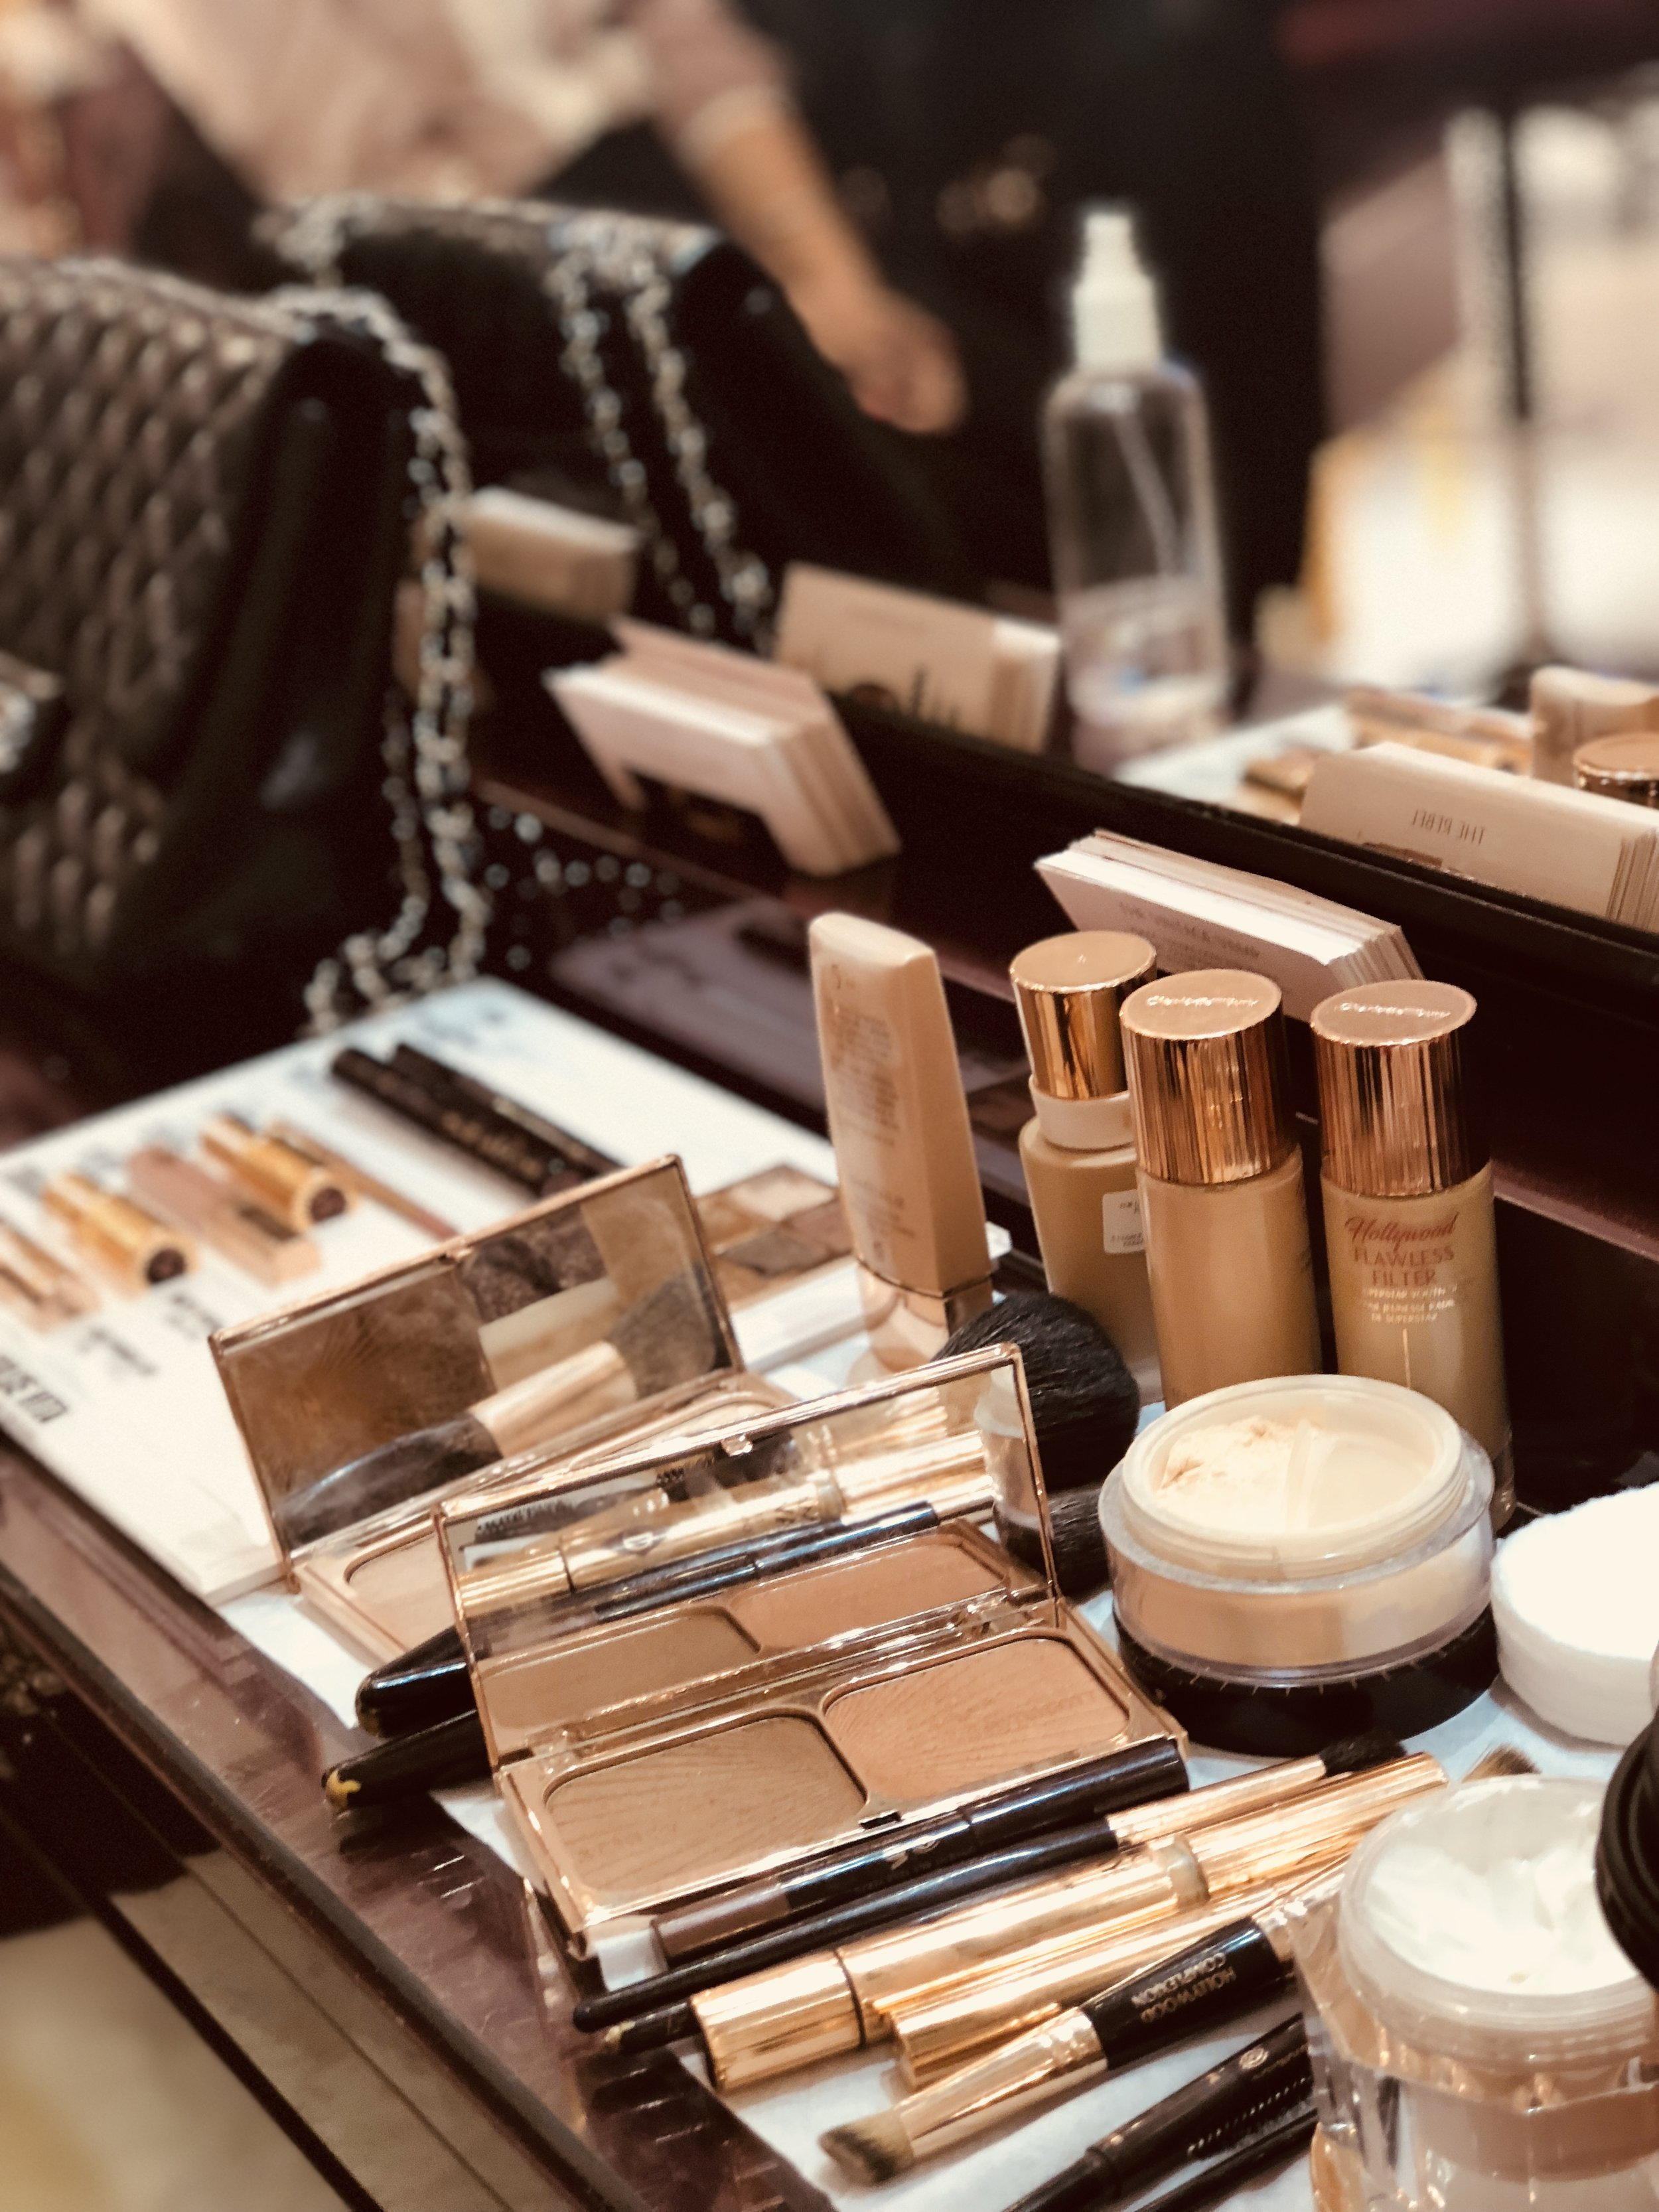 Charlotte Tilbury: Make-Up Session